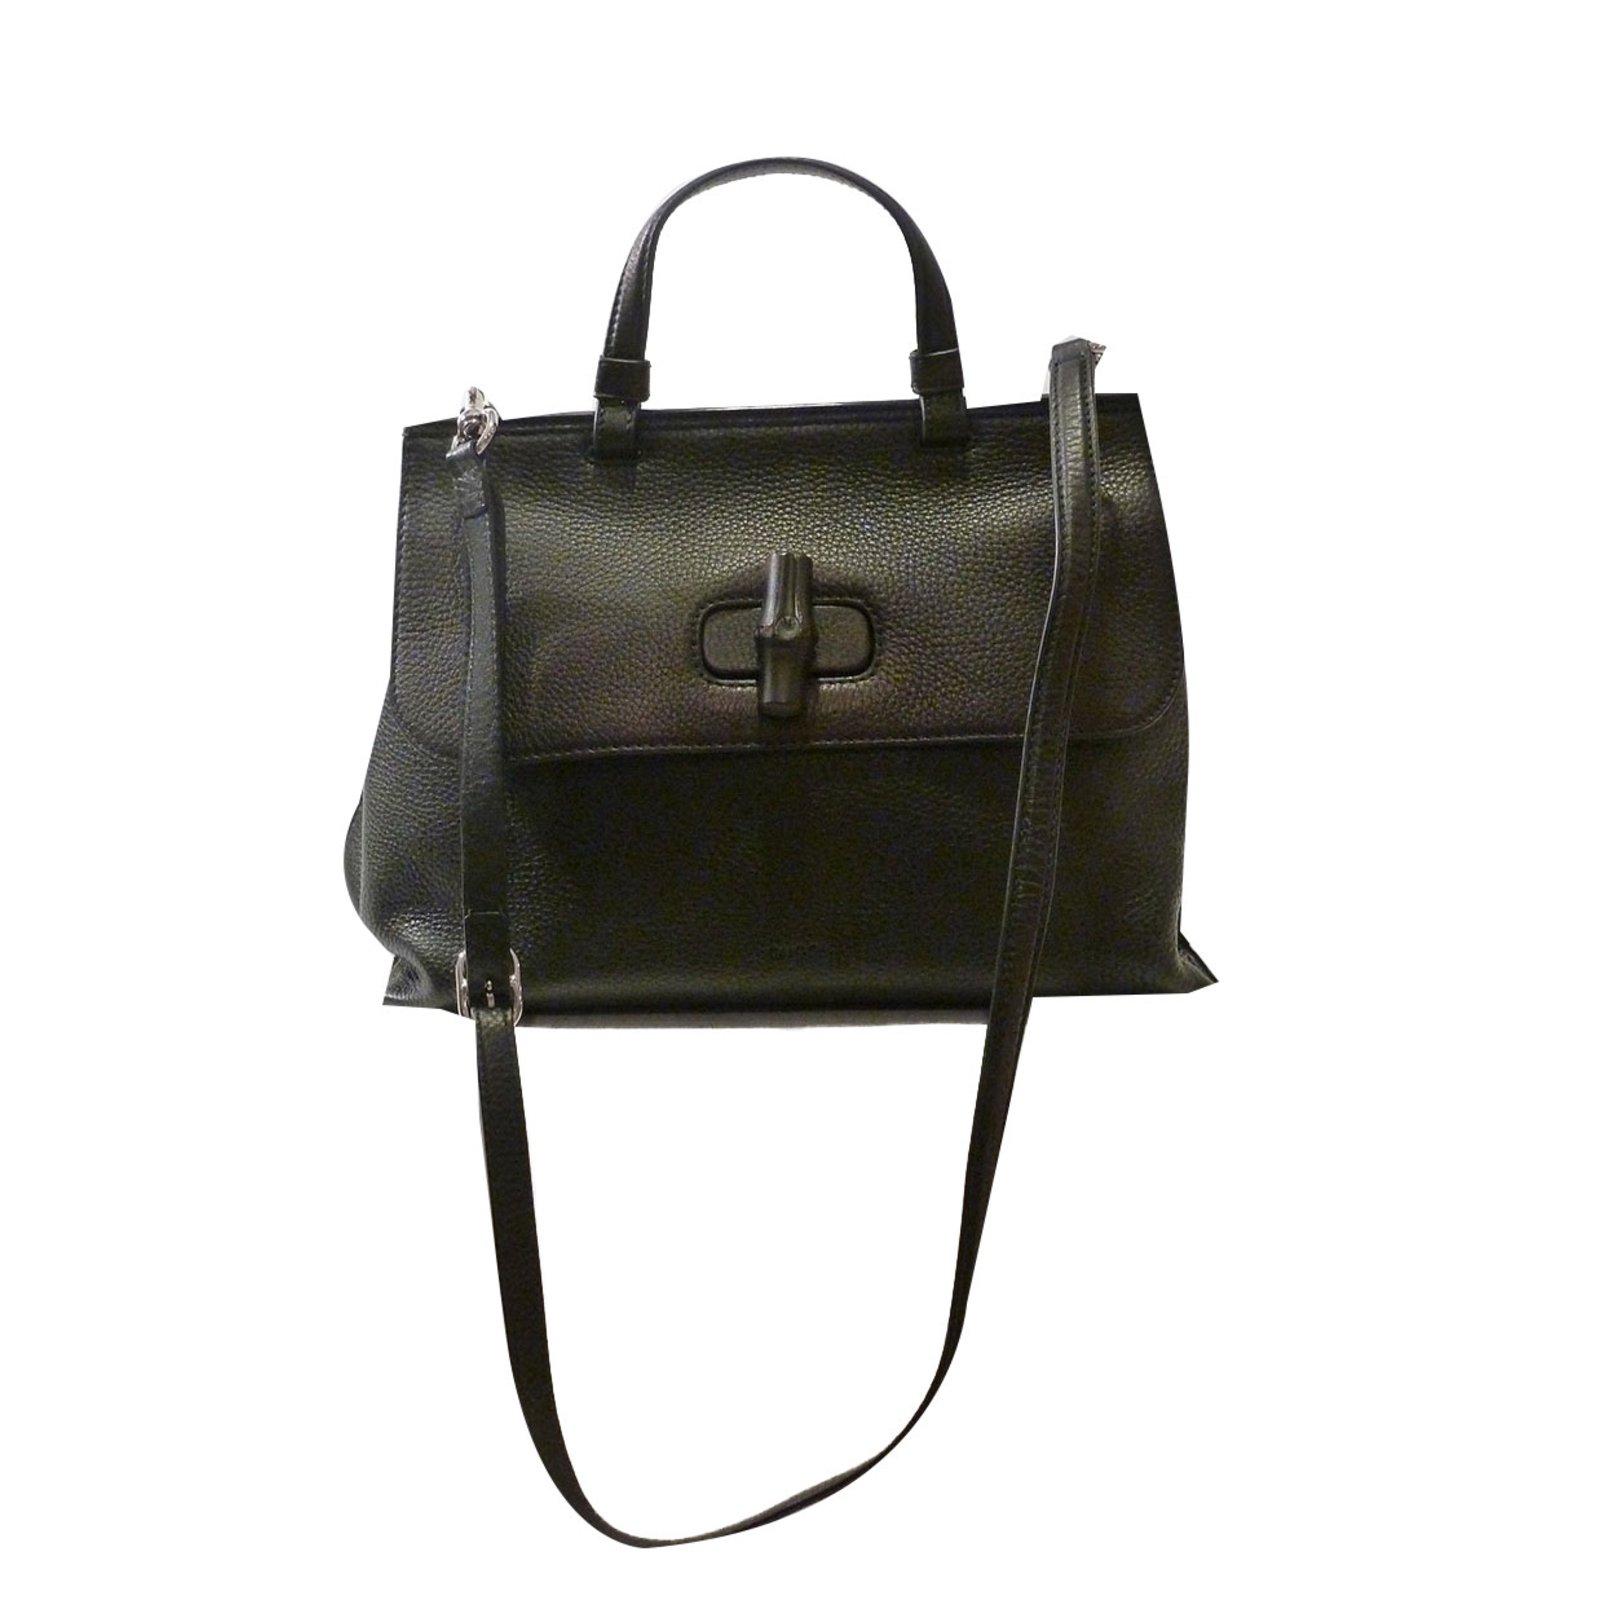 Gucci Medium Bamboo Daily Top Handle Satchel Handbags Leather Black Ref 58878